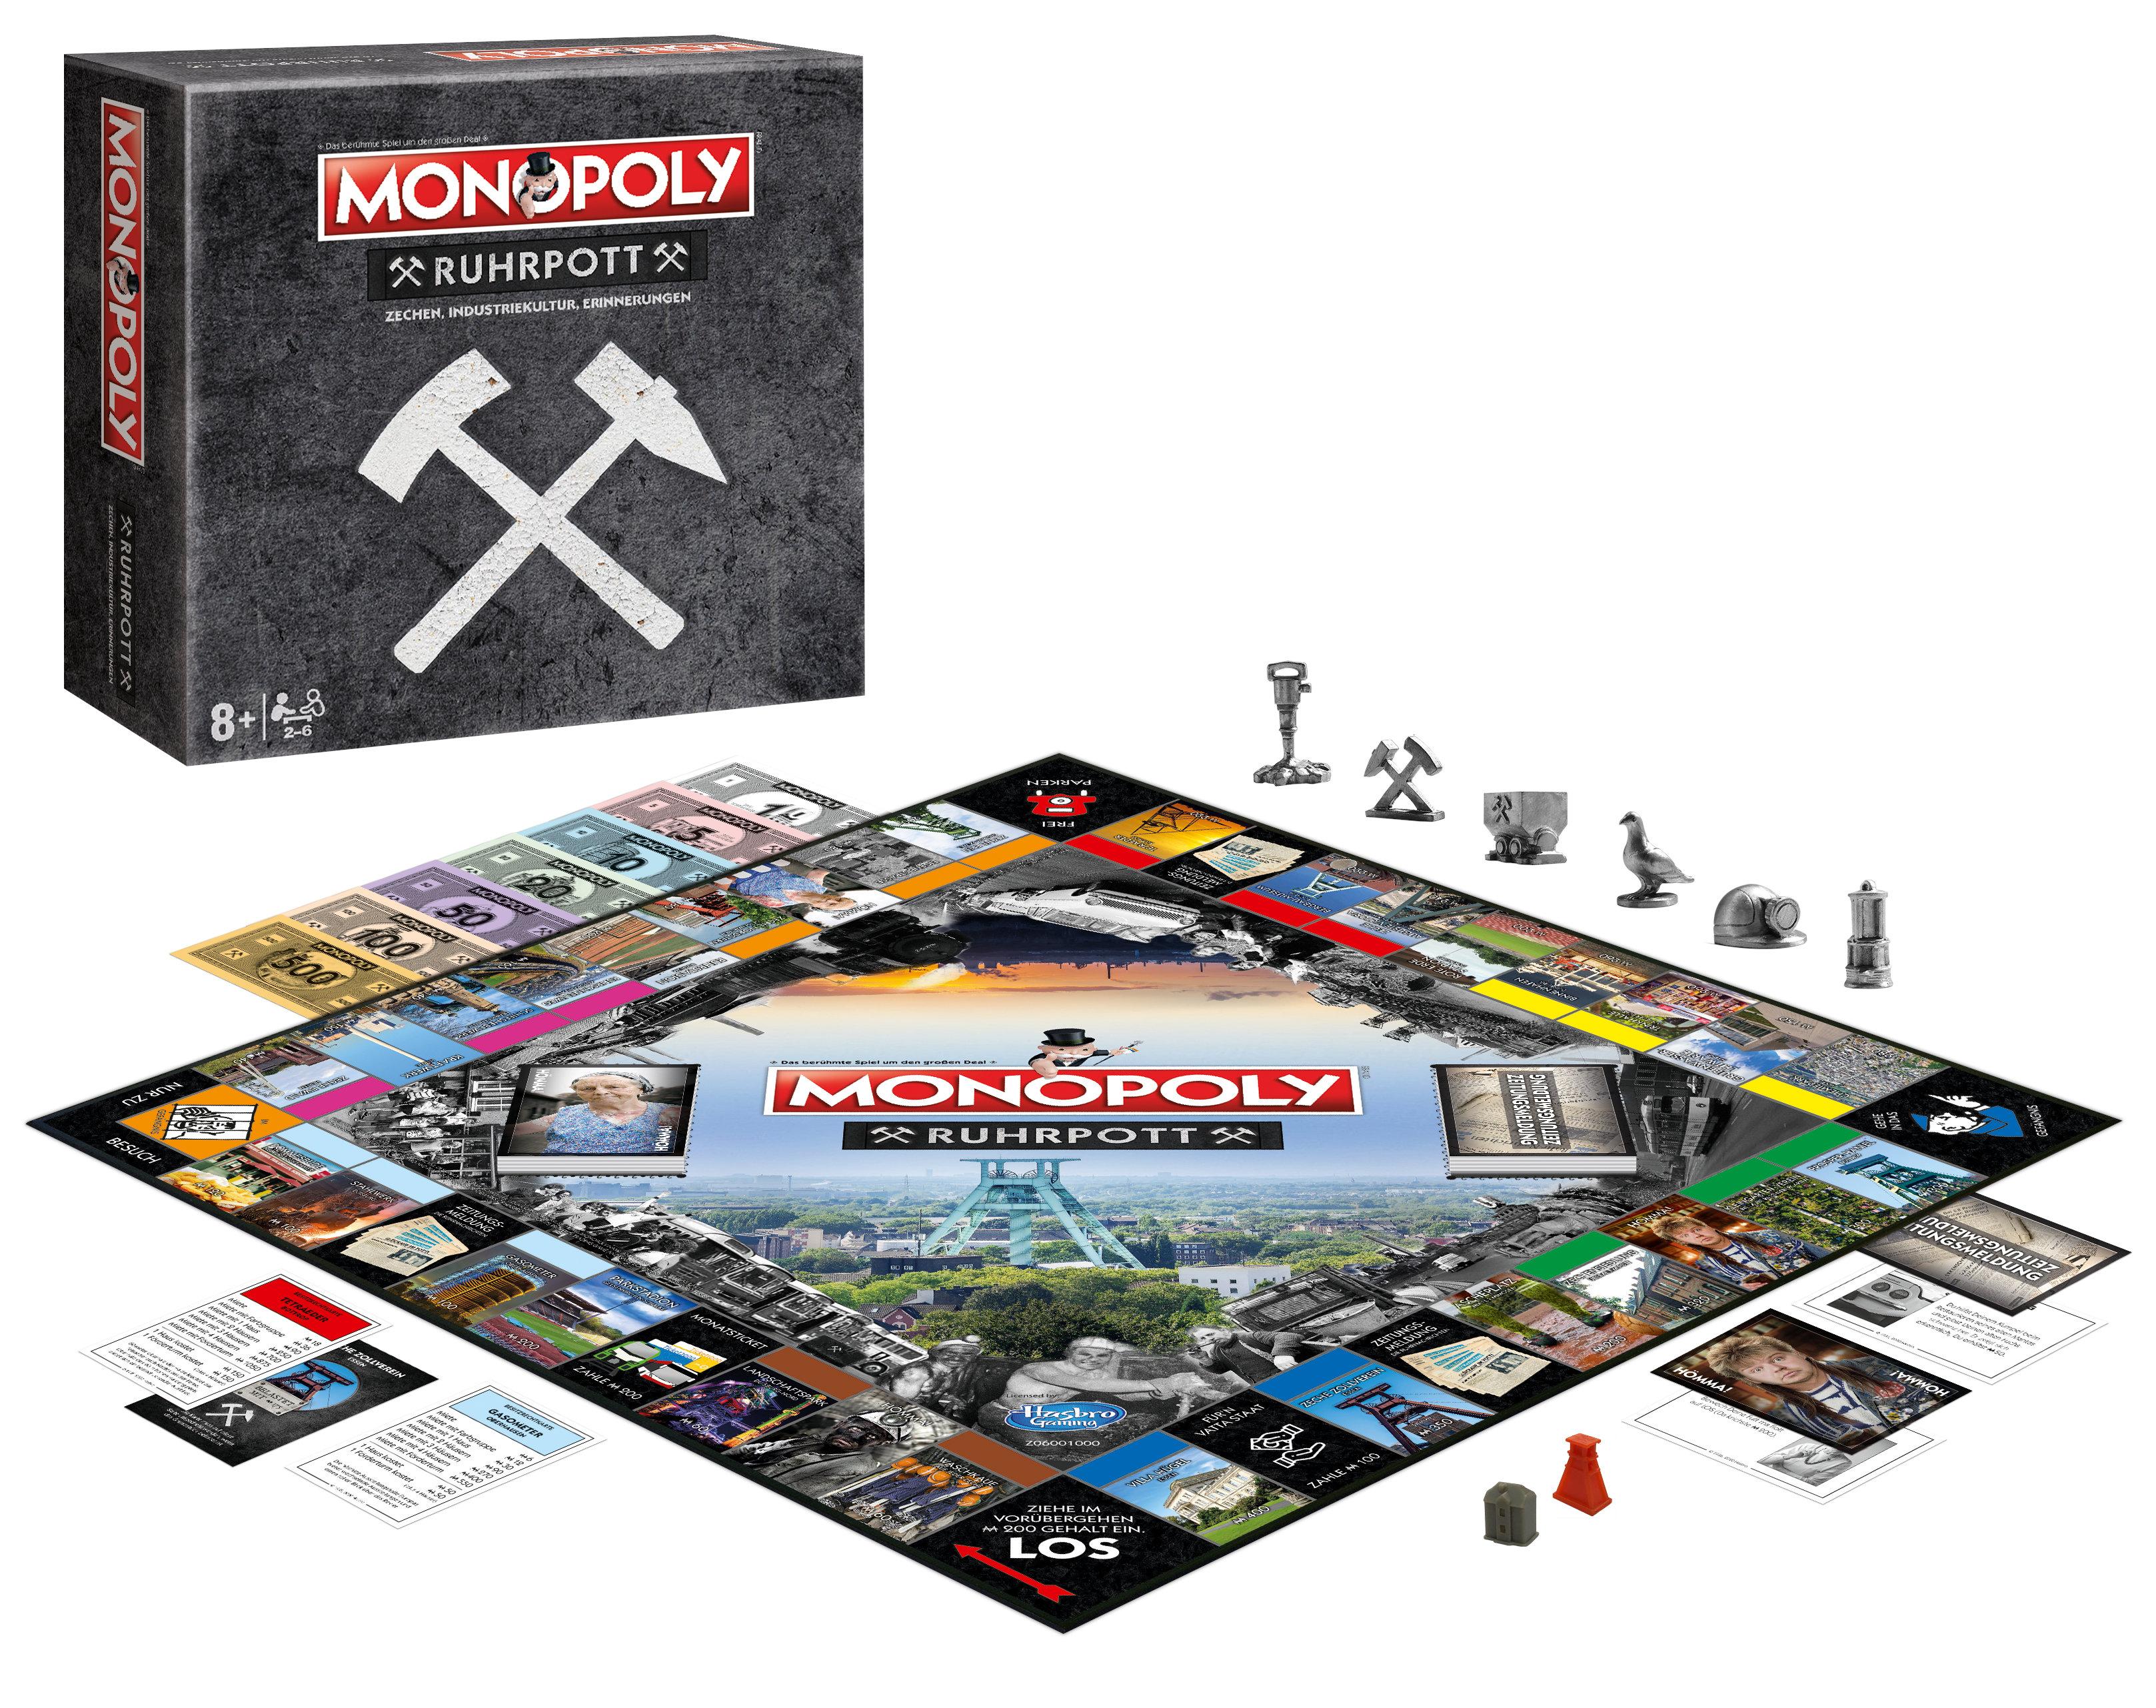 Monopoly Ruhrpott